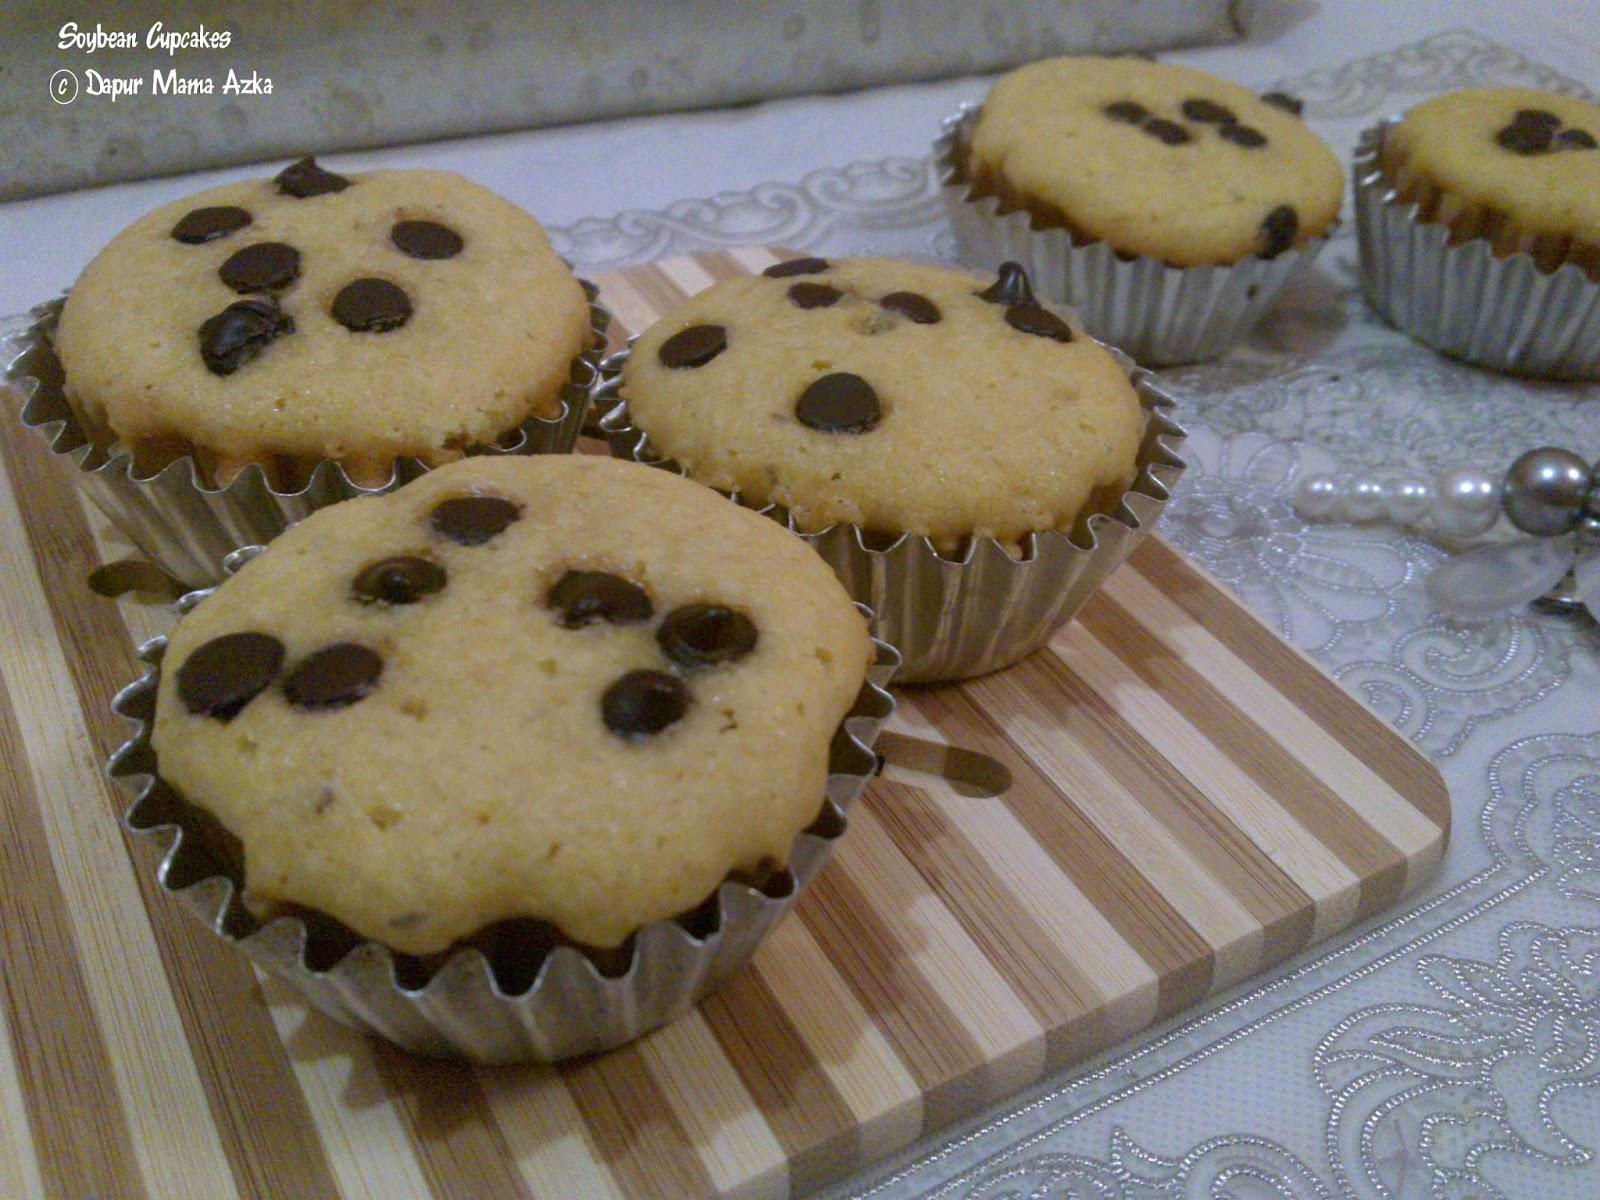 Soybean Cupcakes | Uenake.com | Resep ala Dapur Mama Azka